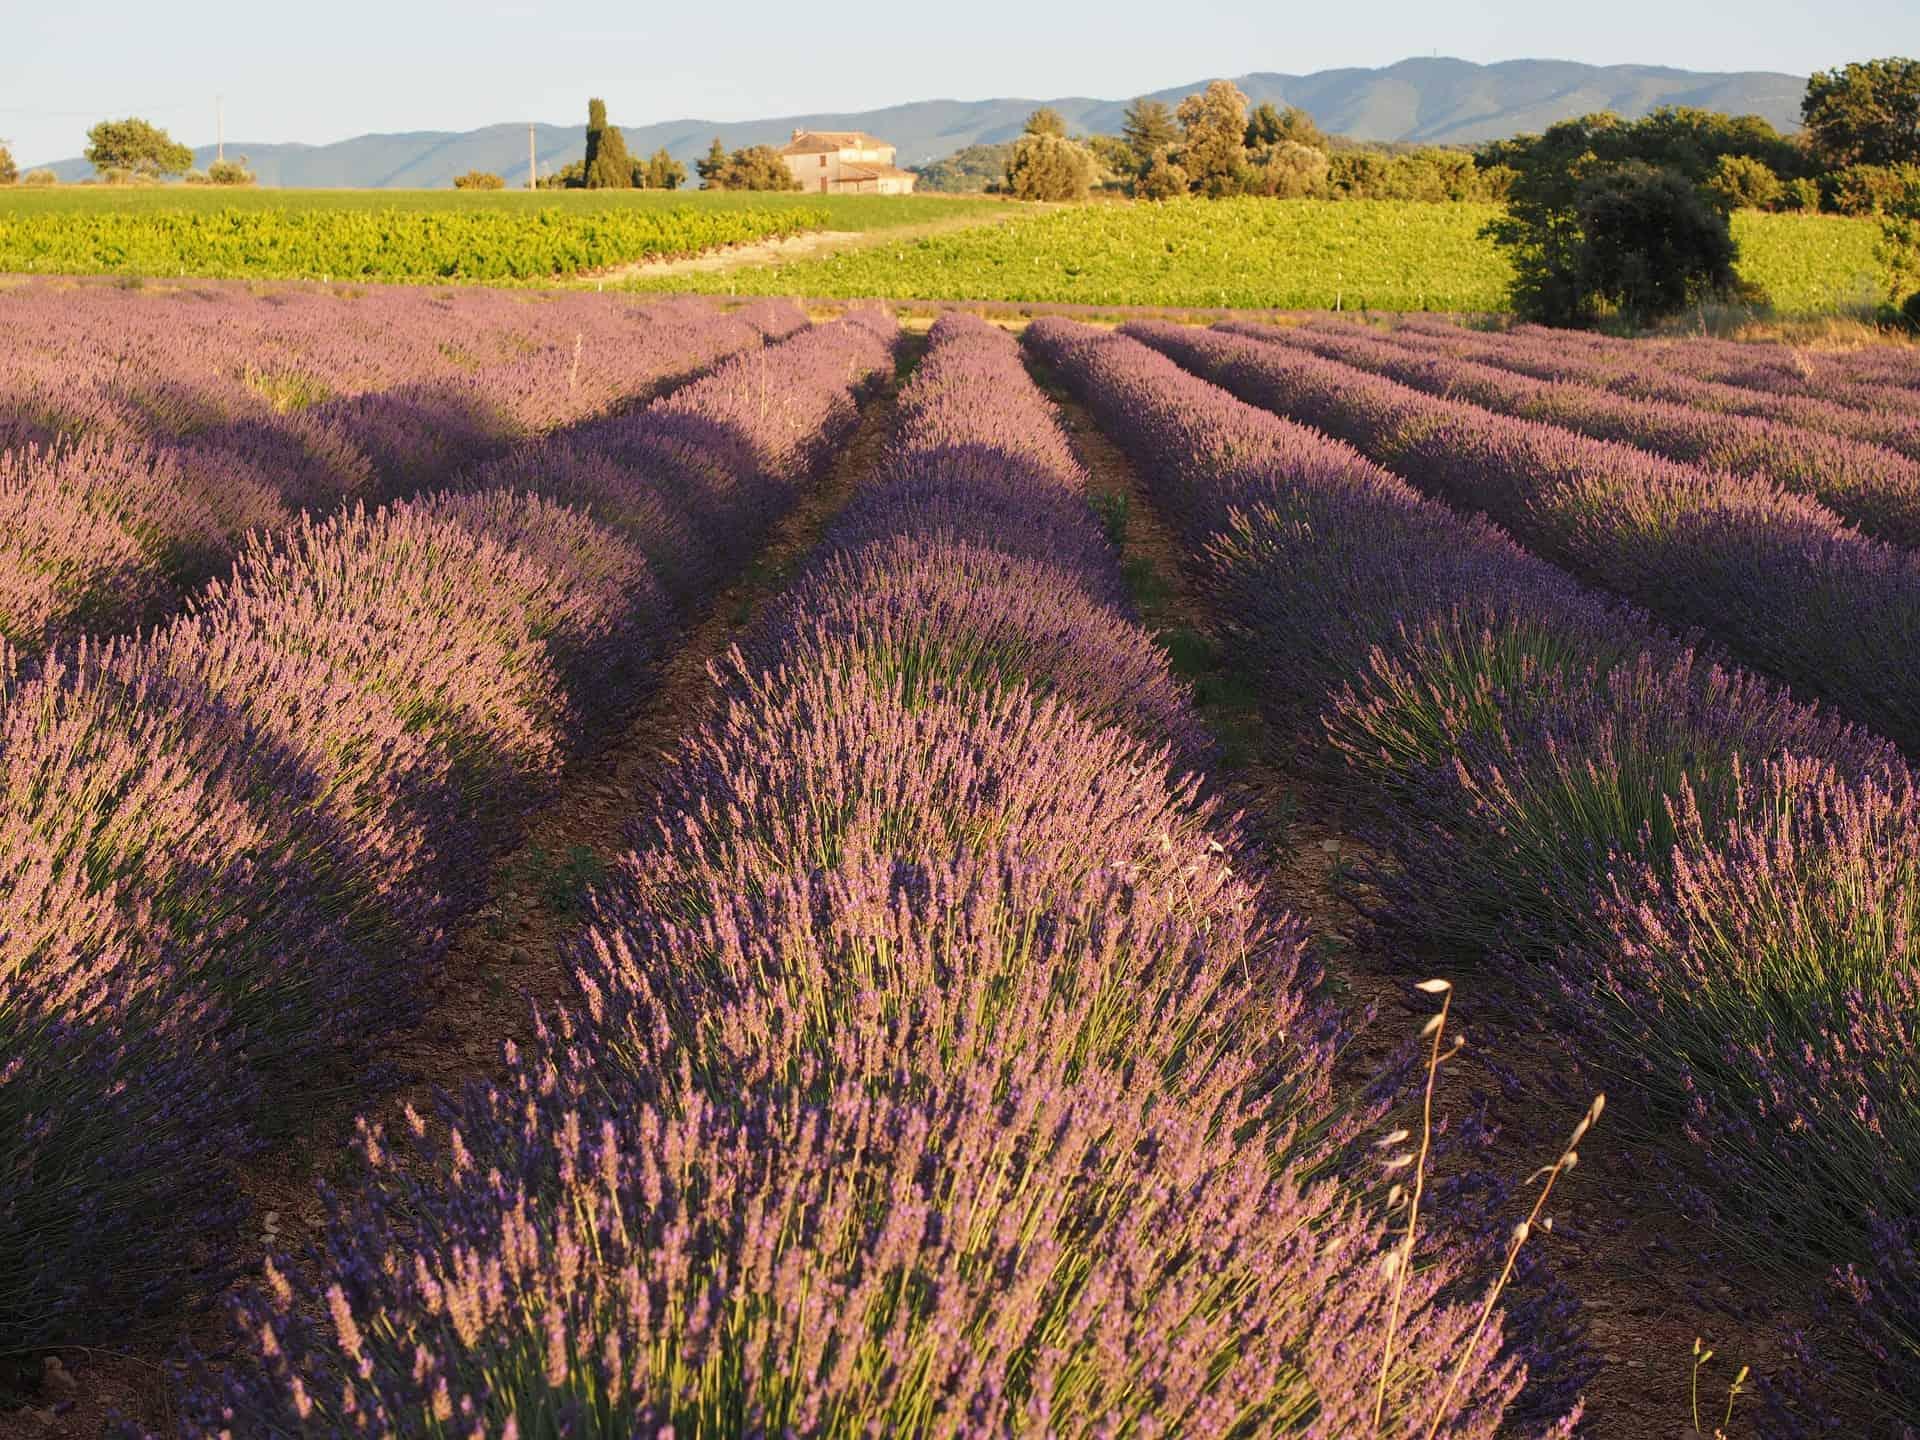 Lavendel Provence, Lavendel marked i Provence, Lavendel i Provence, Aix-en-Provence, romantisk tur til Provence, ting å gjøre i Provence, langhelg i Provence, weekendtur til Provence, ferie i Provence, ting å gjøre i Provence, lavendel i Provence, dagsturer i Provence